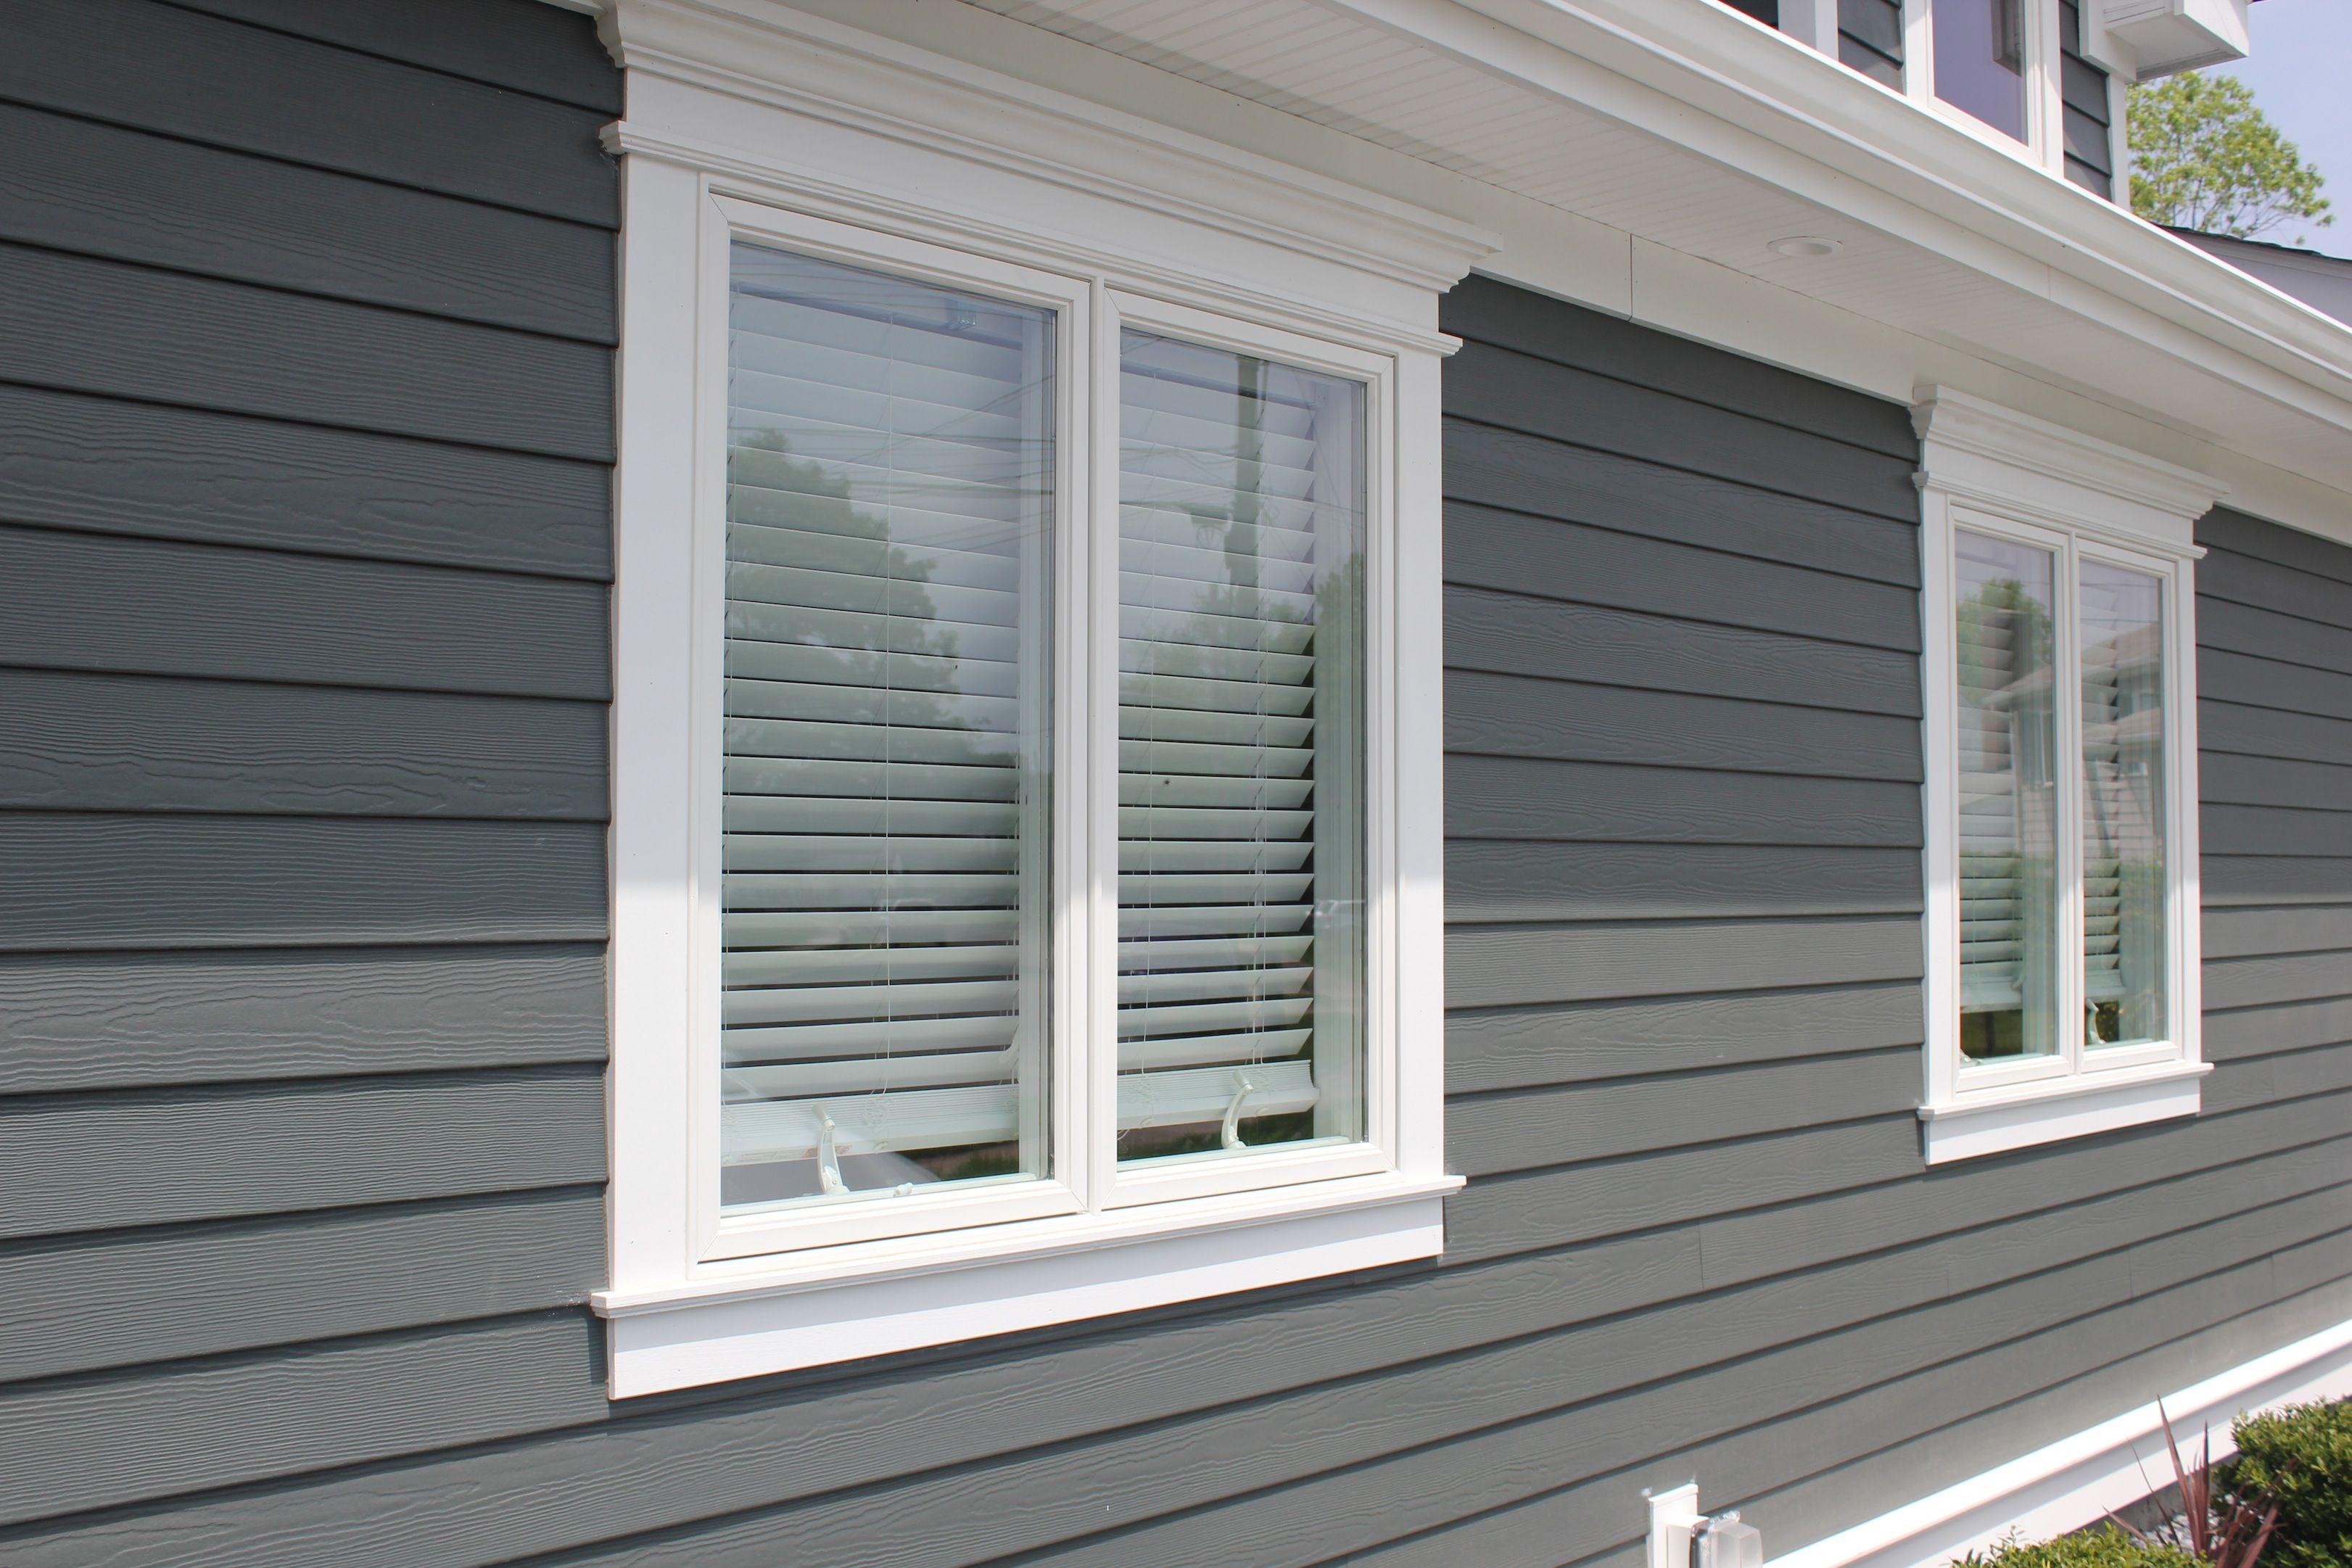 James Hardie Siding Home Ny Gray House Ideas Nursery Blue Window Trim Home Ideas Exterior House Colors Shingle Siding Exterior Siding Options